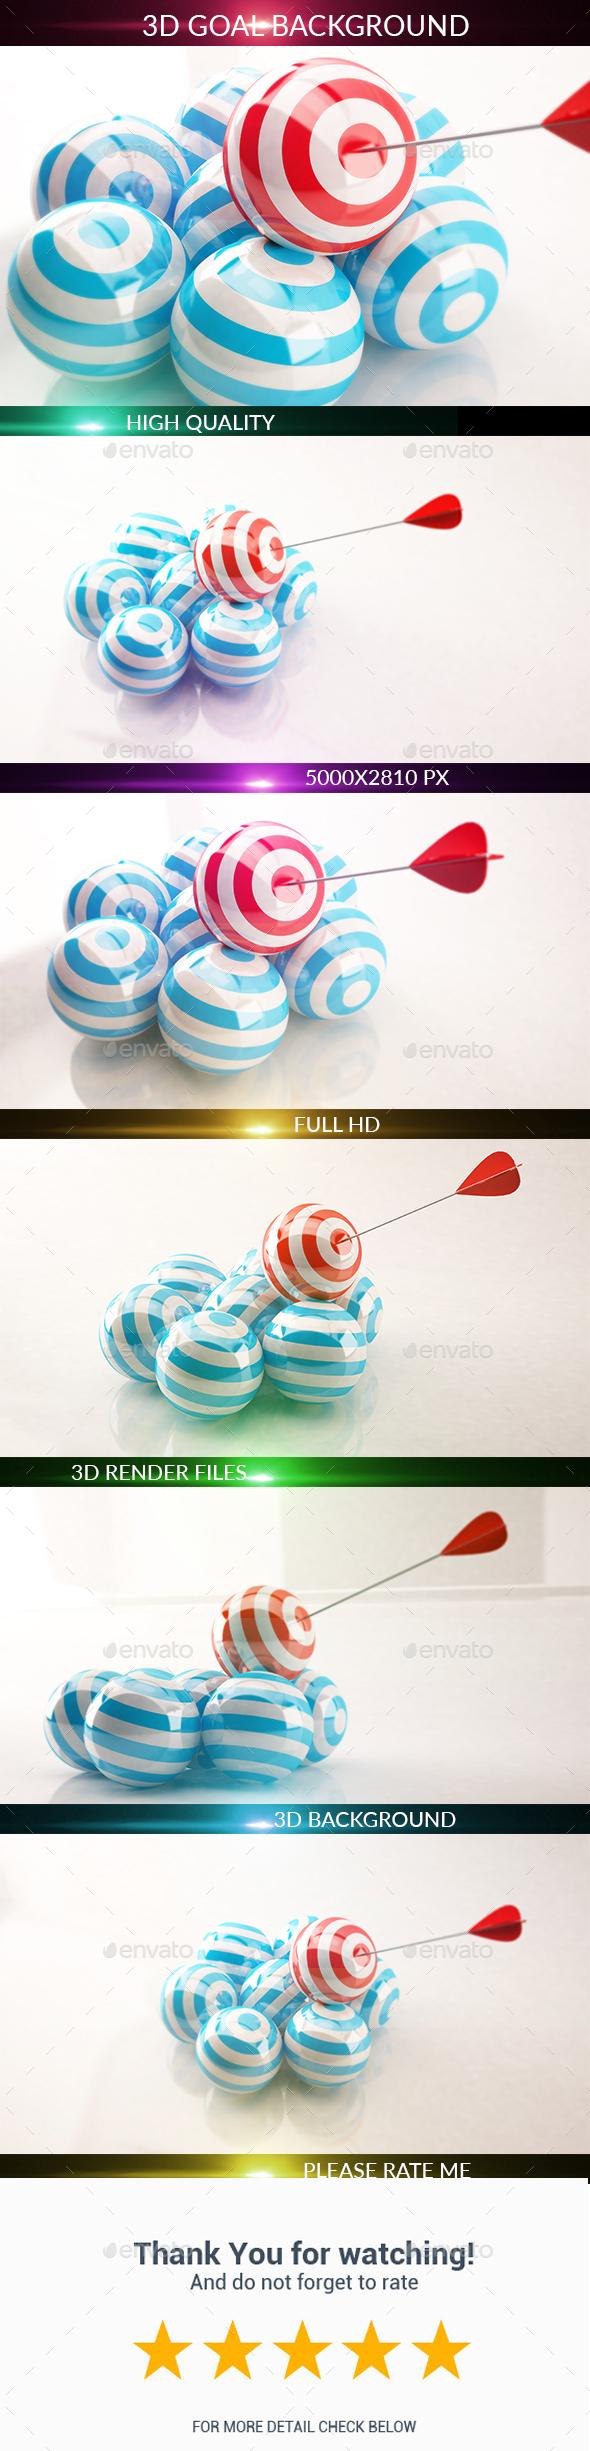 3D Goal - 3D Backgrounds